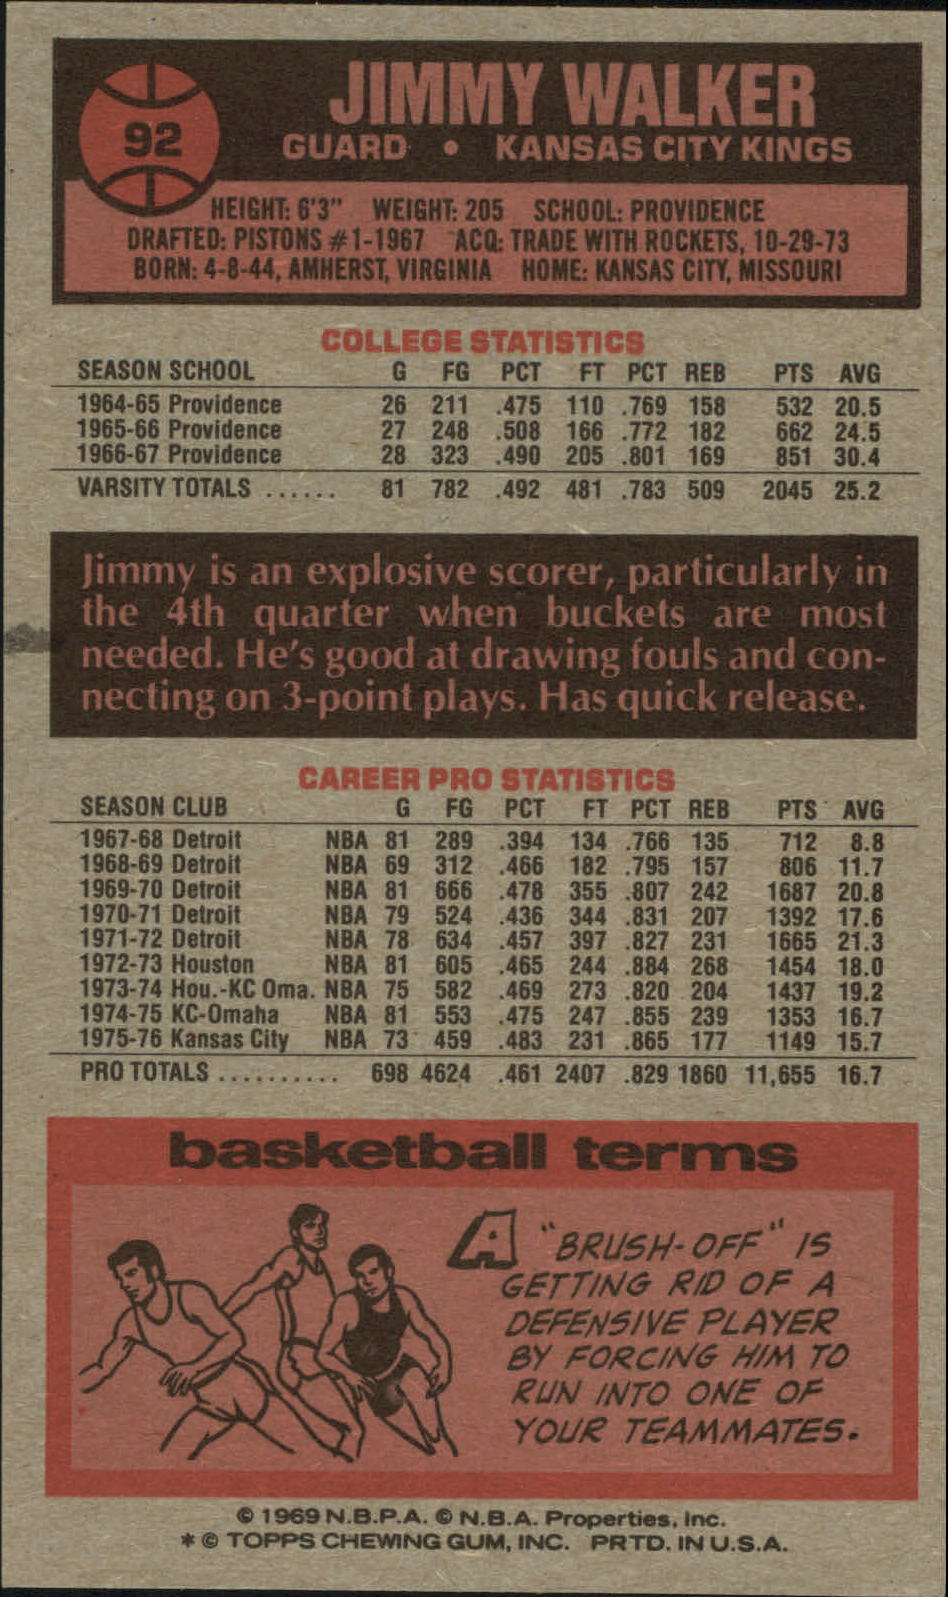 1976-77 Topps #92 Jimmy Walker back image